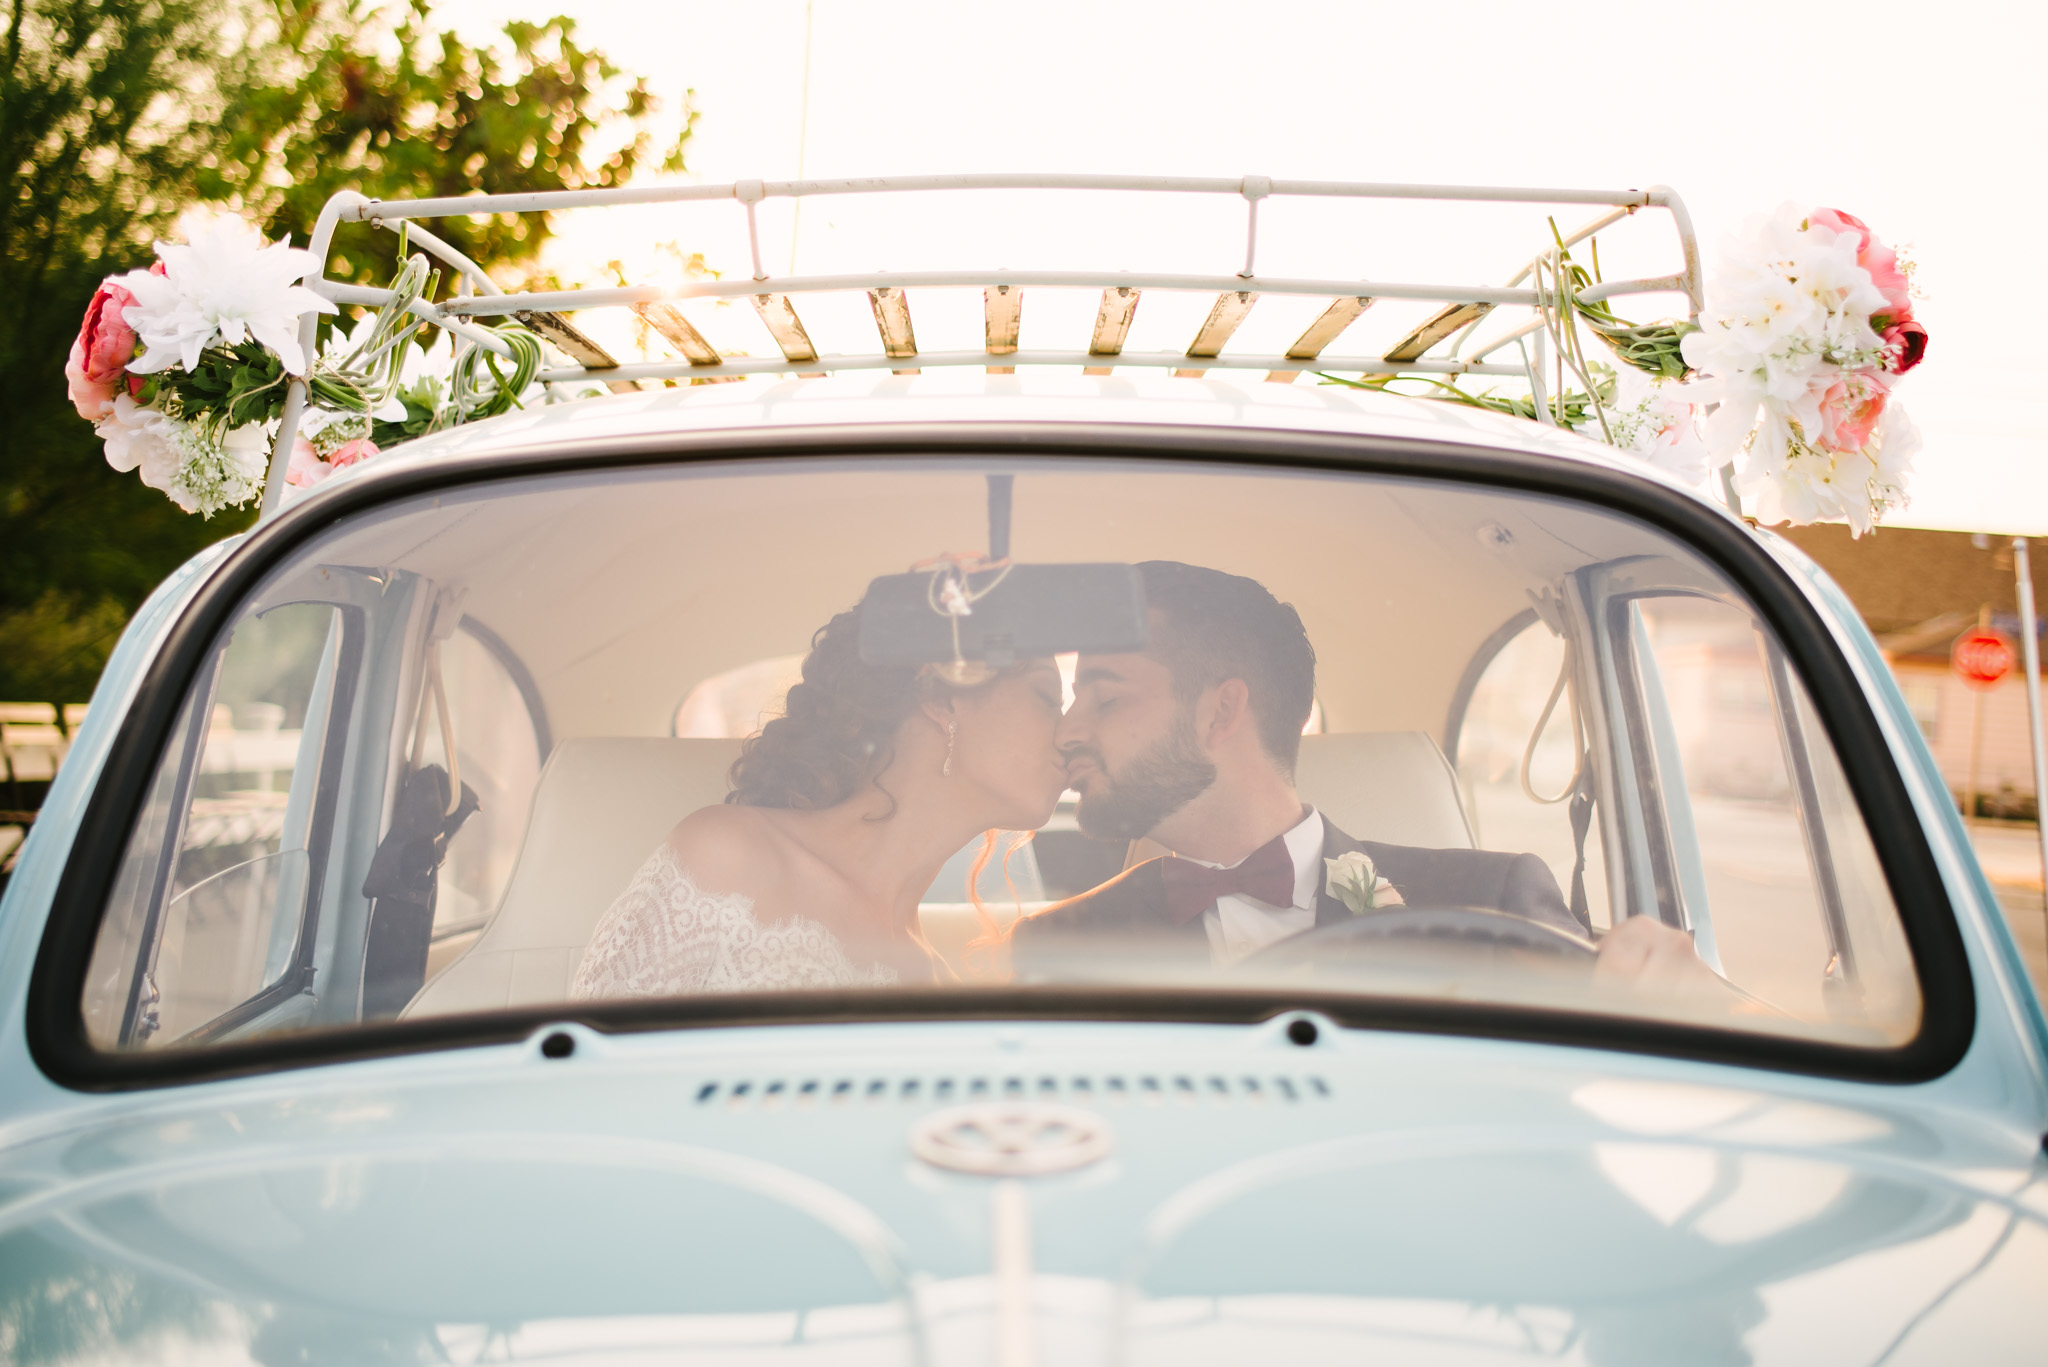 0546-LJ-The-Ruby-Street-Los-Angeles-County-Wedding-Photography.jpg